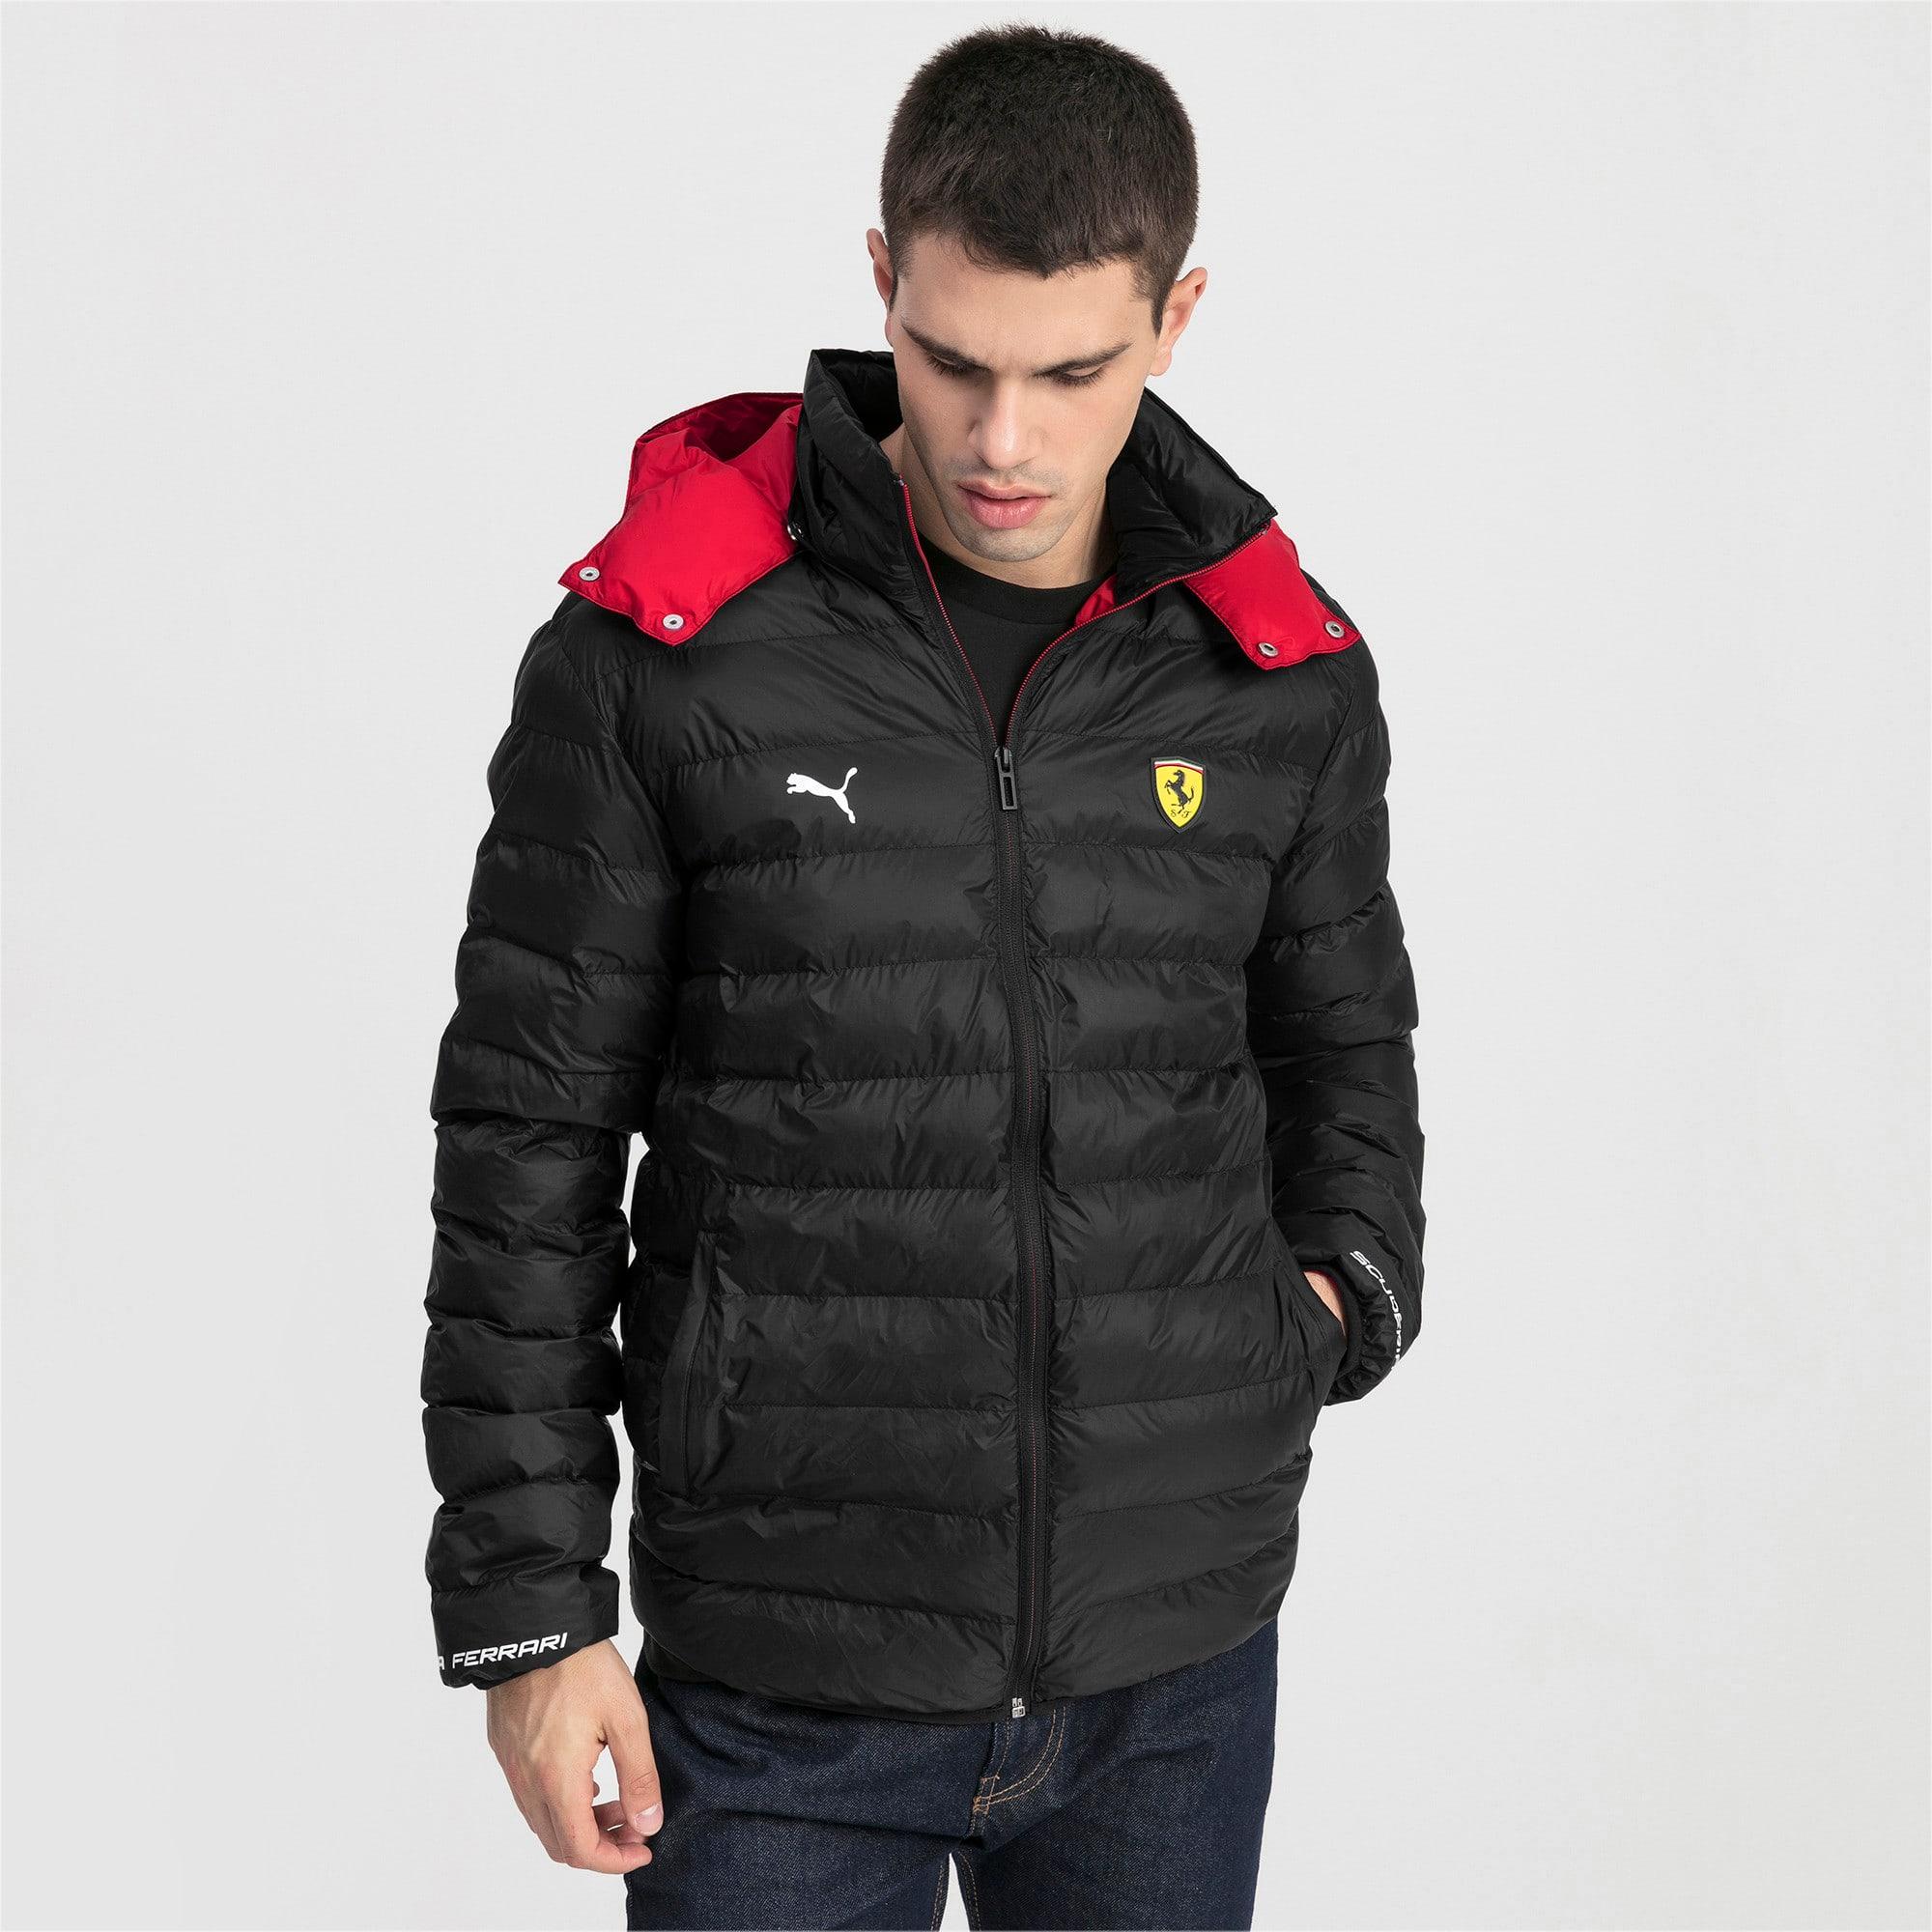 Thumbnail 1 van Ferrari Eco PackLITE jas voor mannen, Puma Black, medium